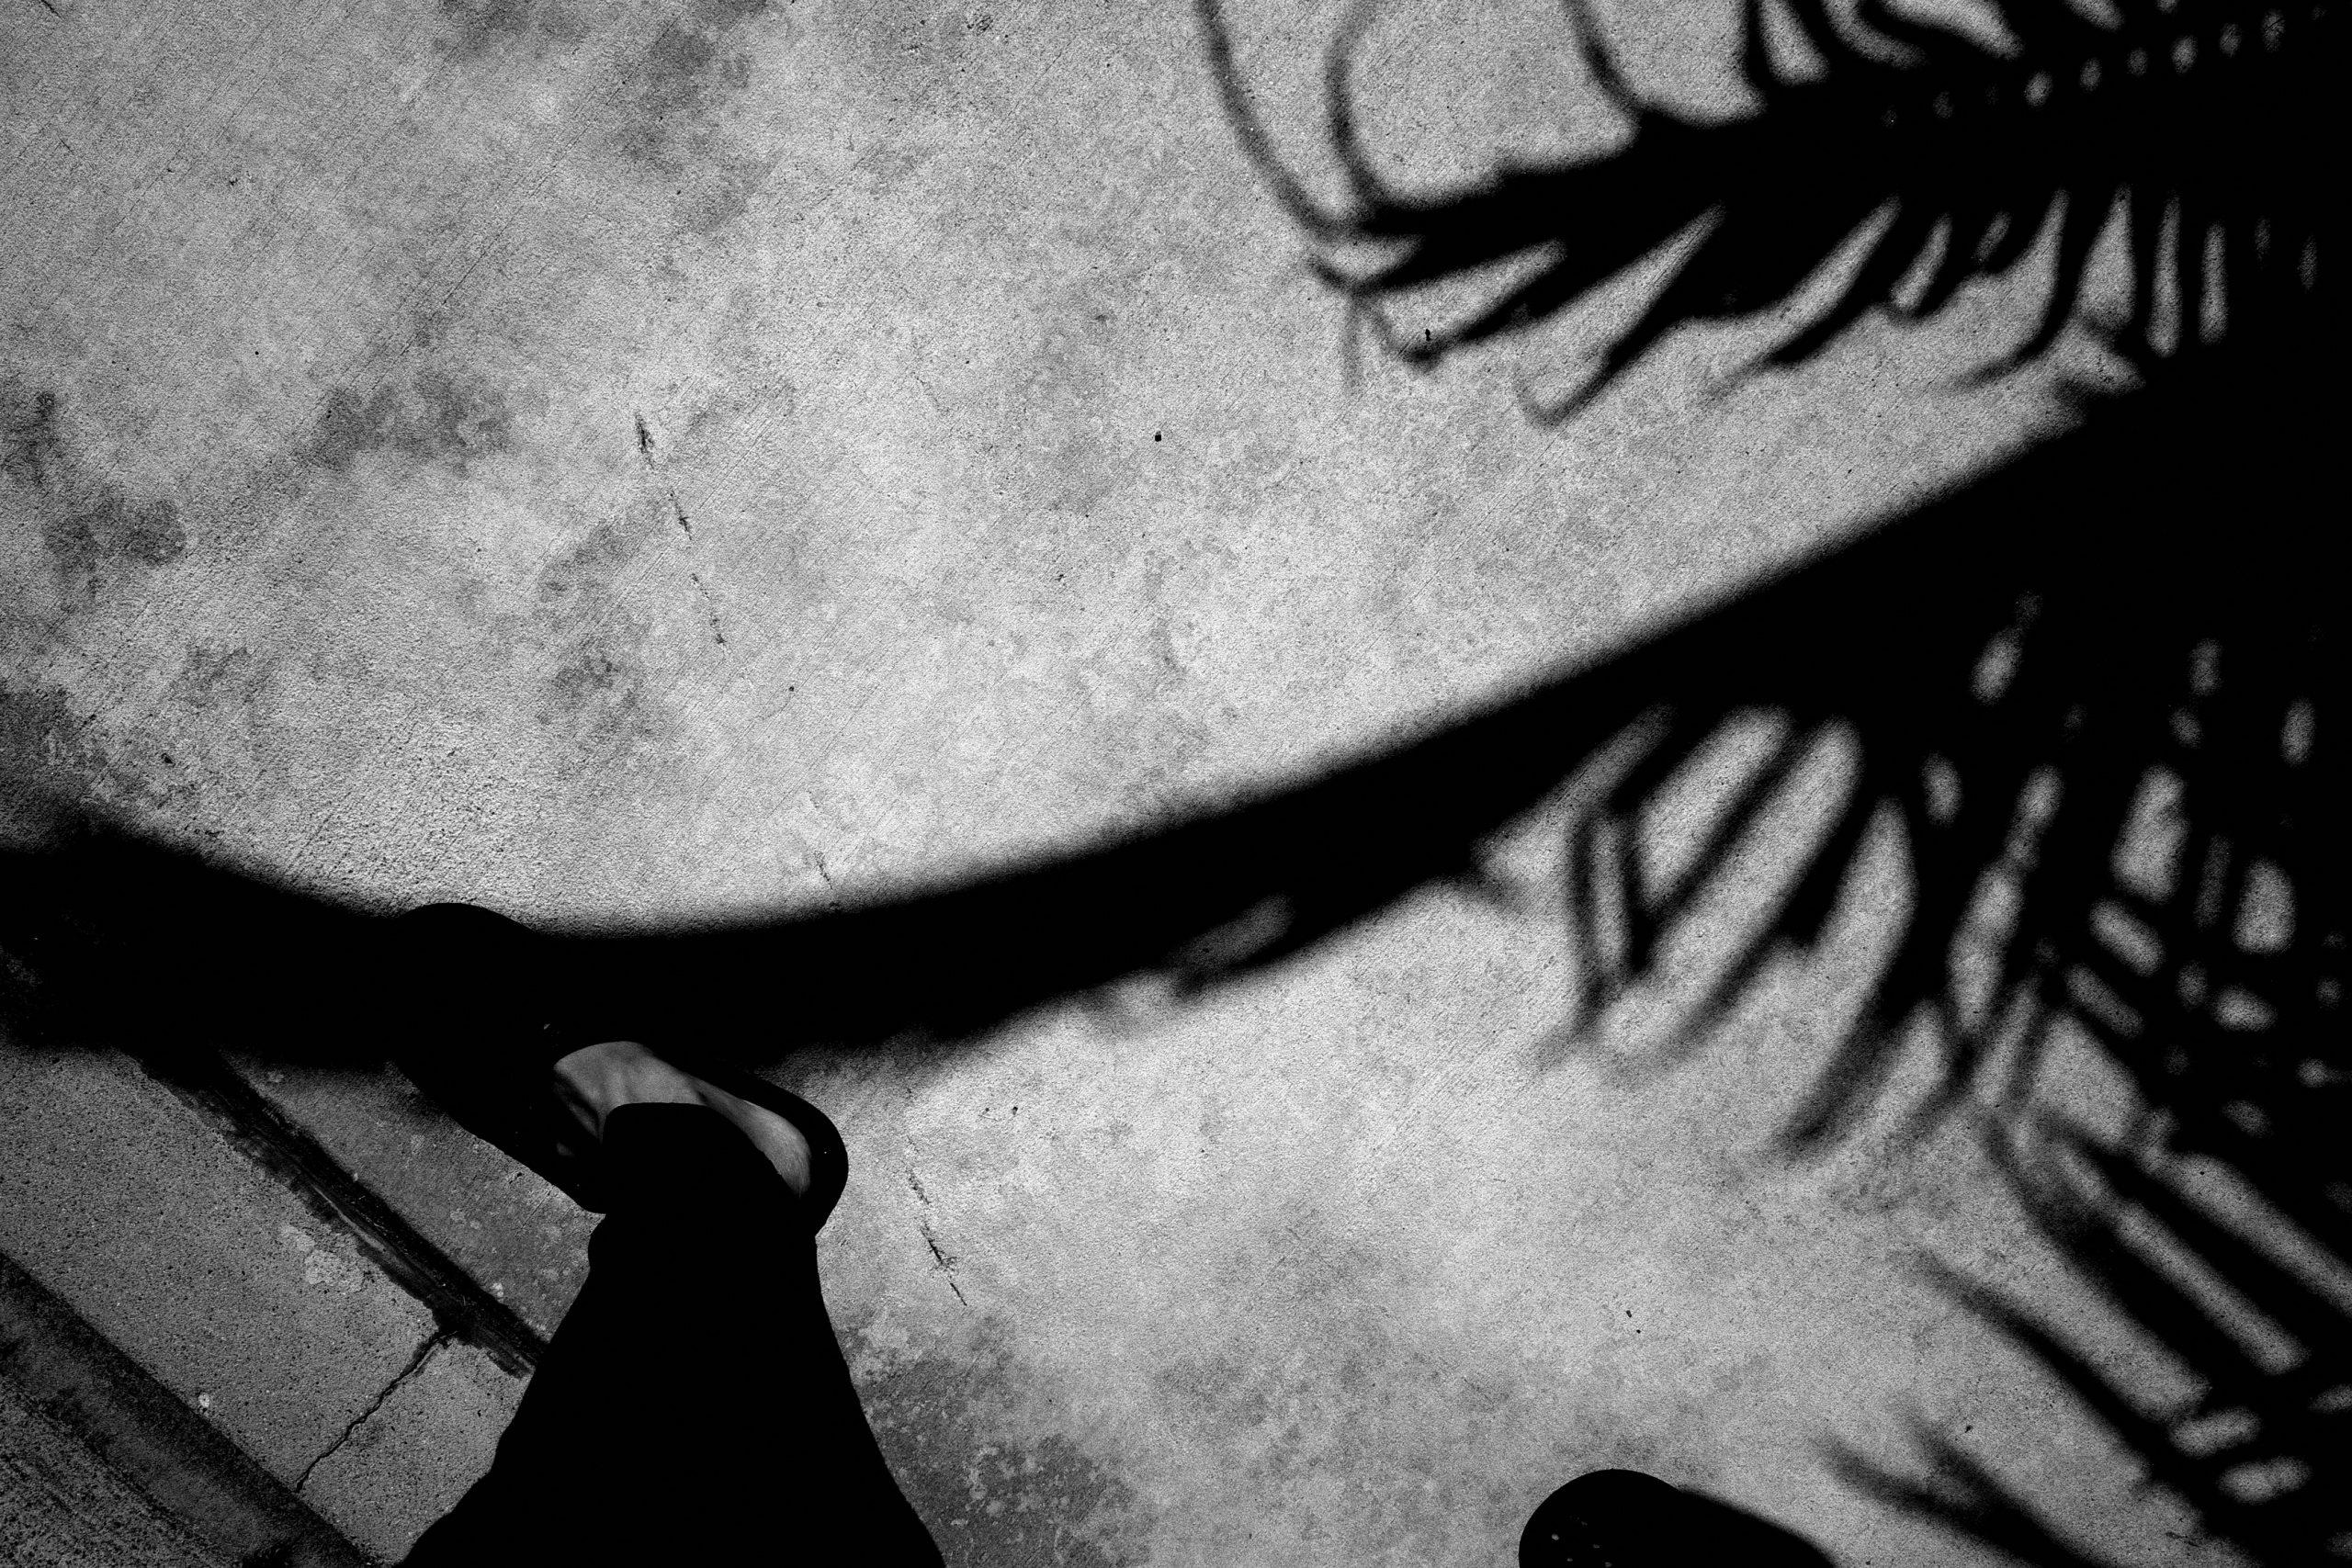 ERIC KIM shadow